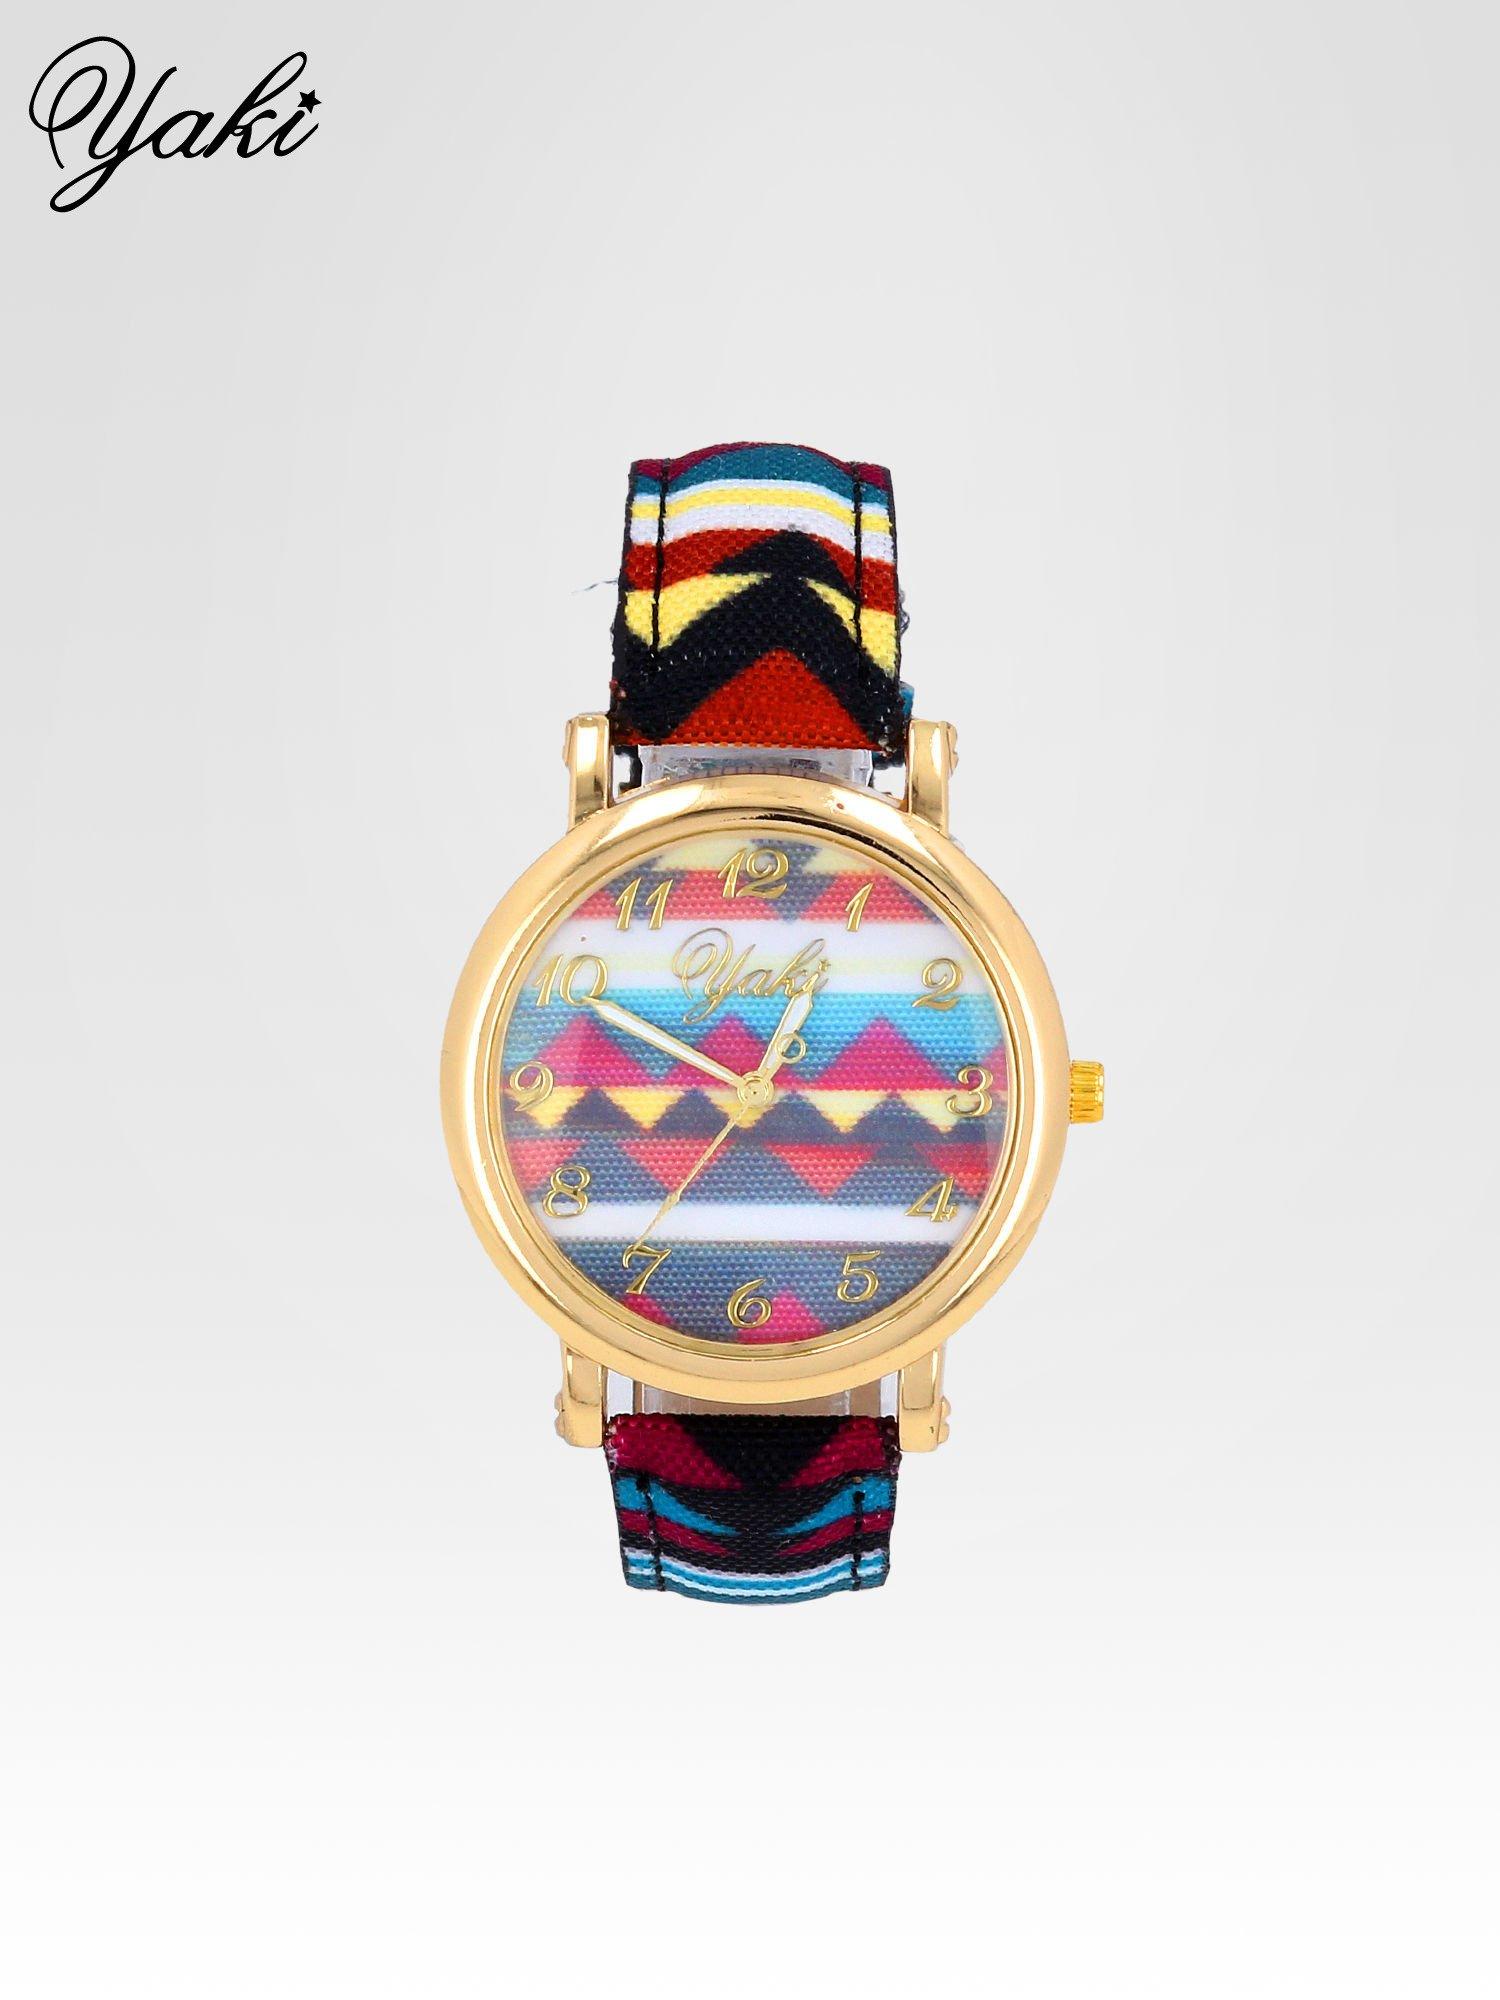 Zegarek damski na pasku z motywem azteckim                                  zdj.                                  1